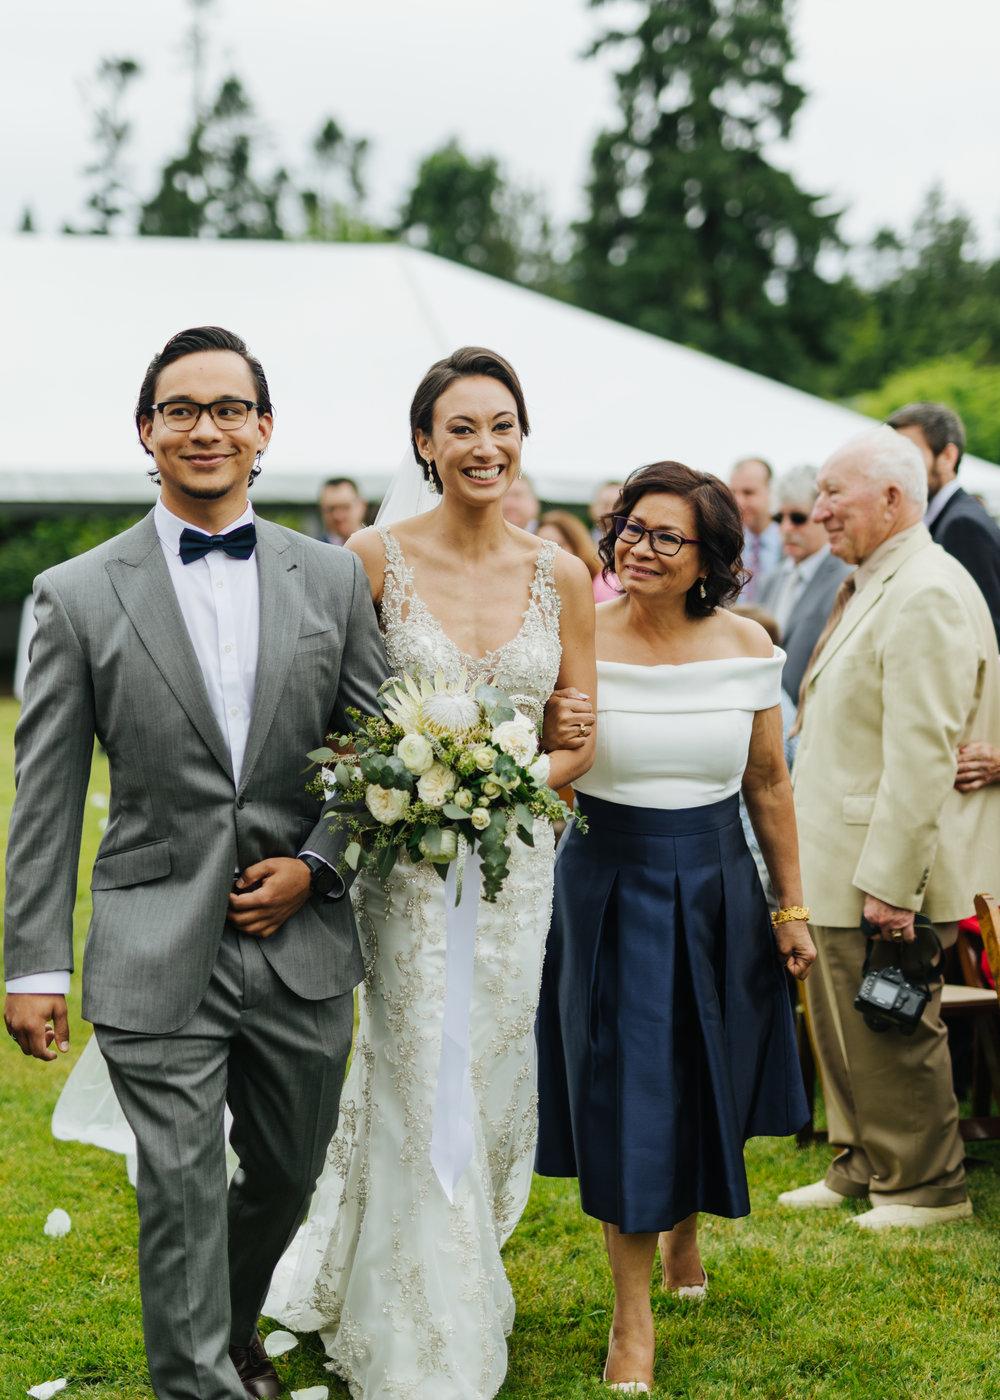 herafilms_wedding_jayne_connor_hera_selects-61.jpg